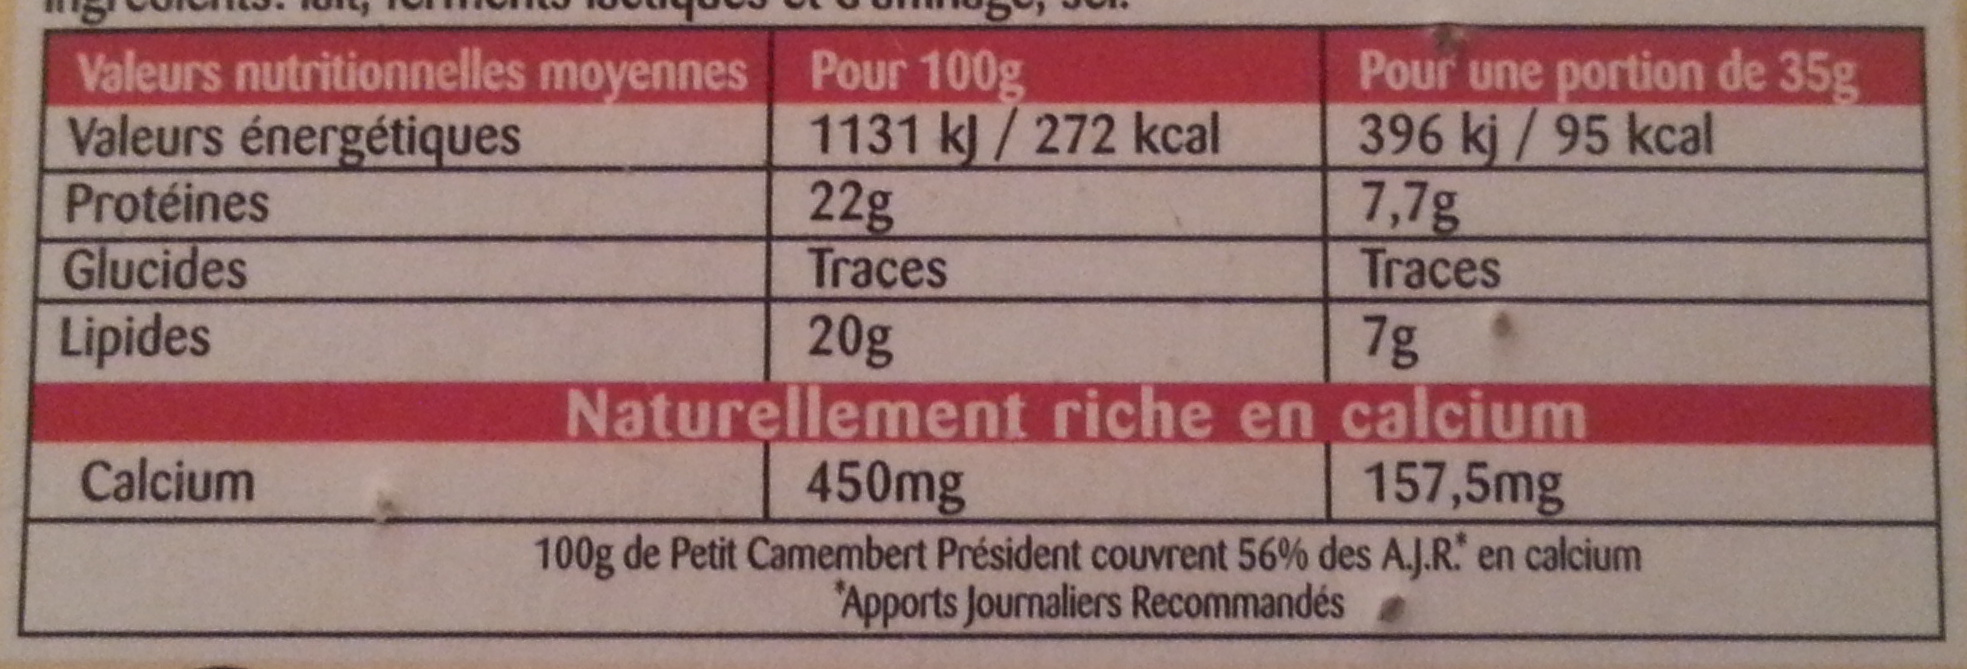 Petit Camembert (20% MG) - Informations nutritionnelles - fr